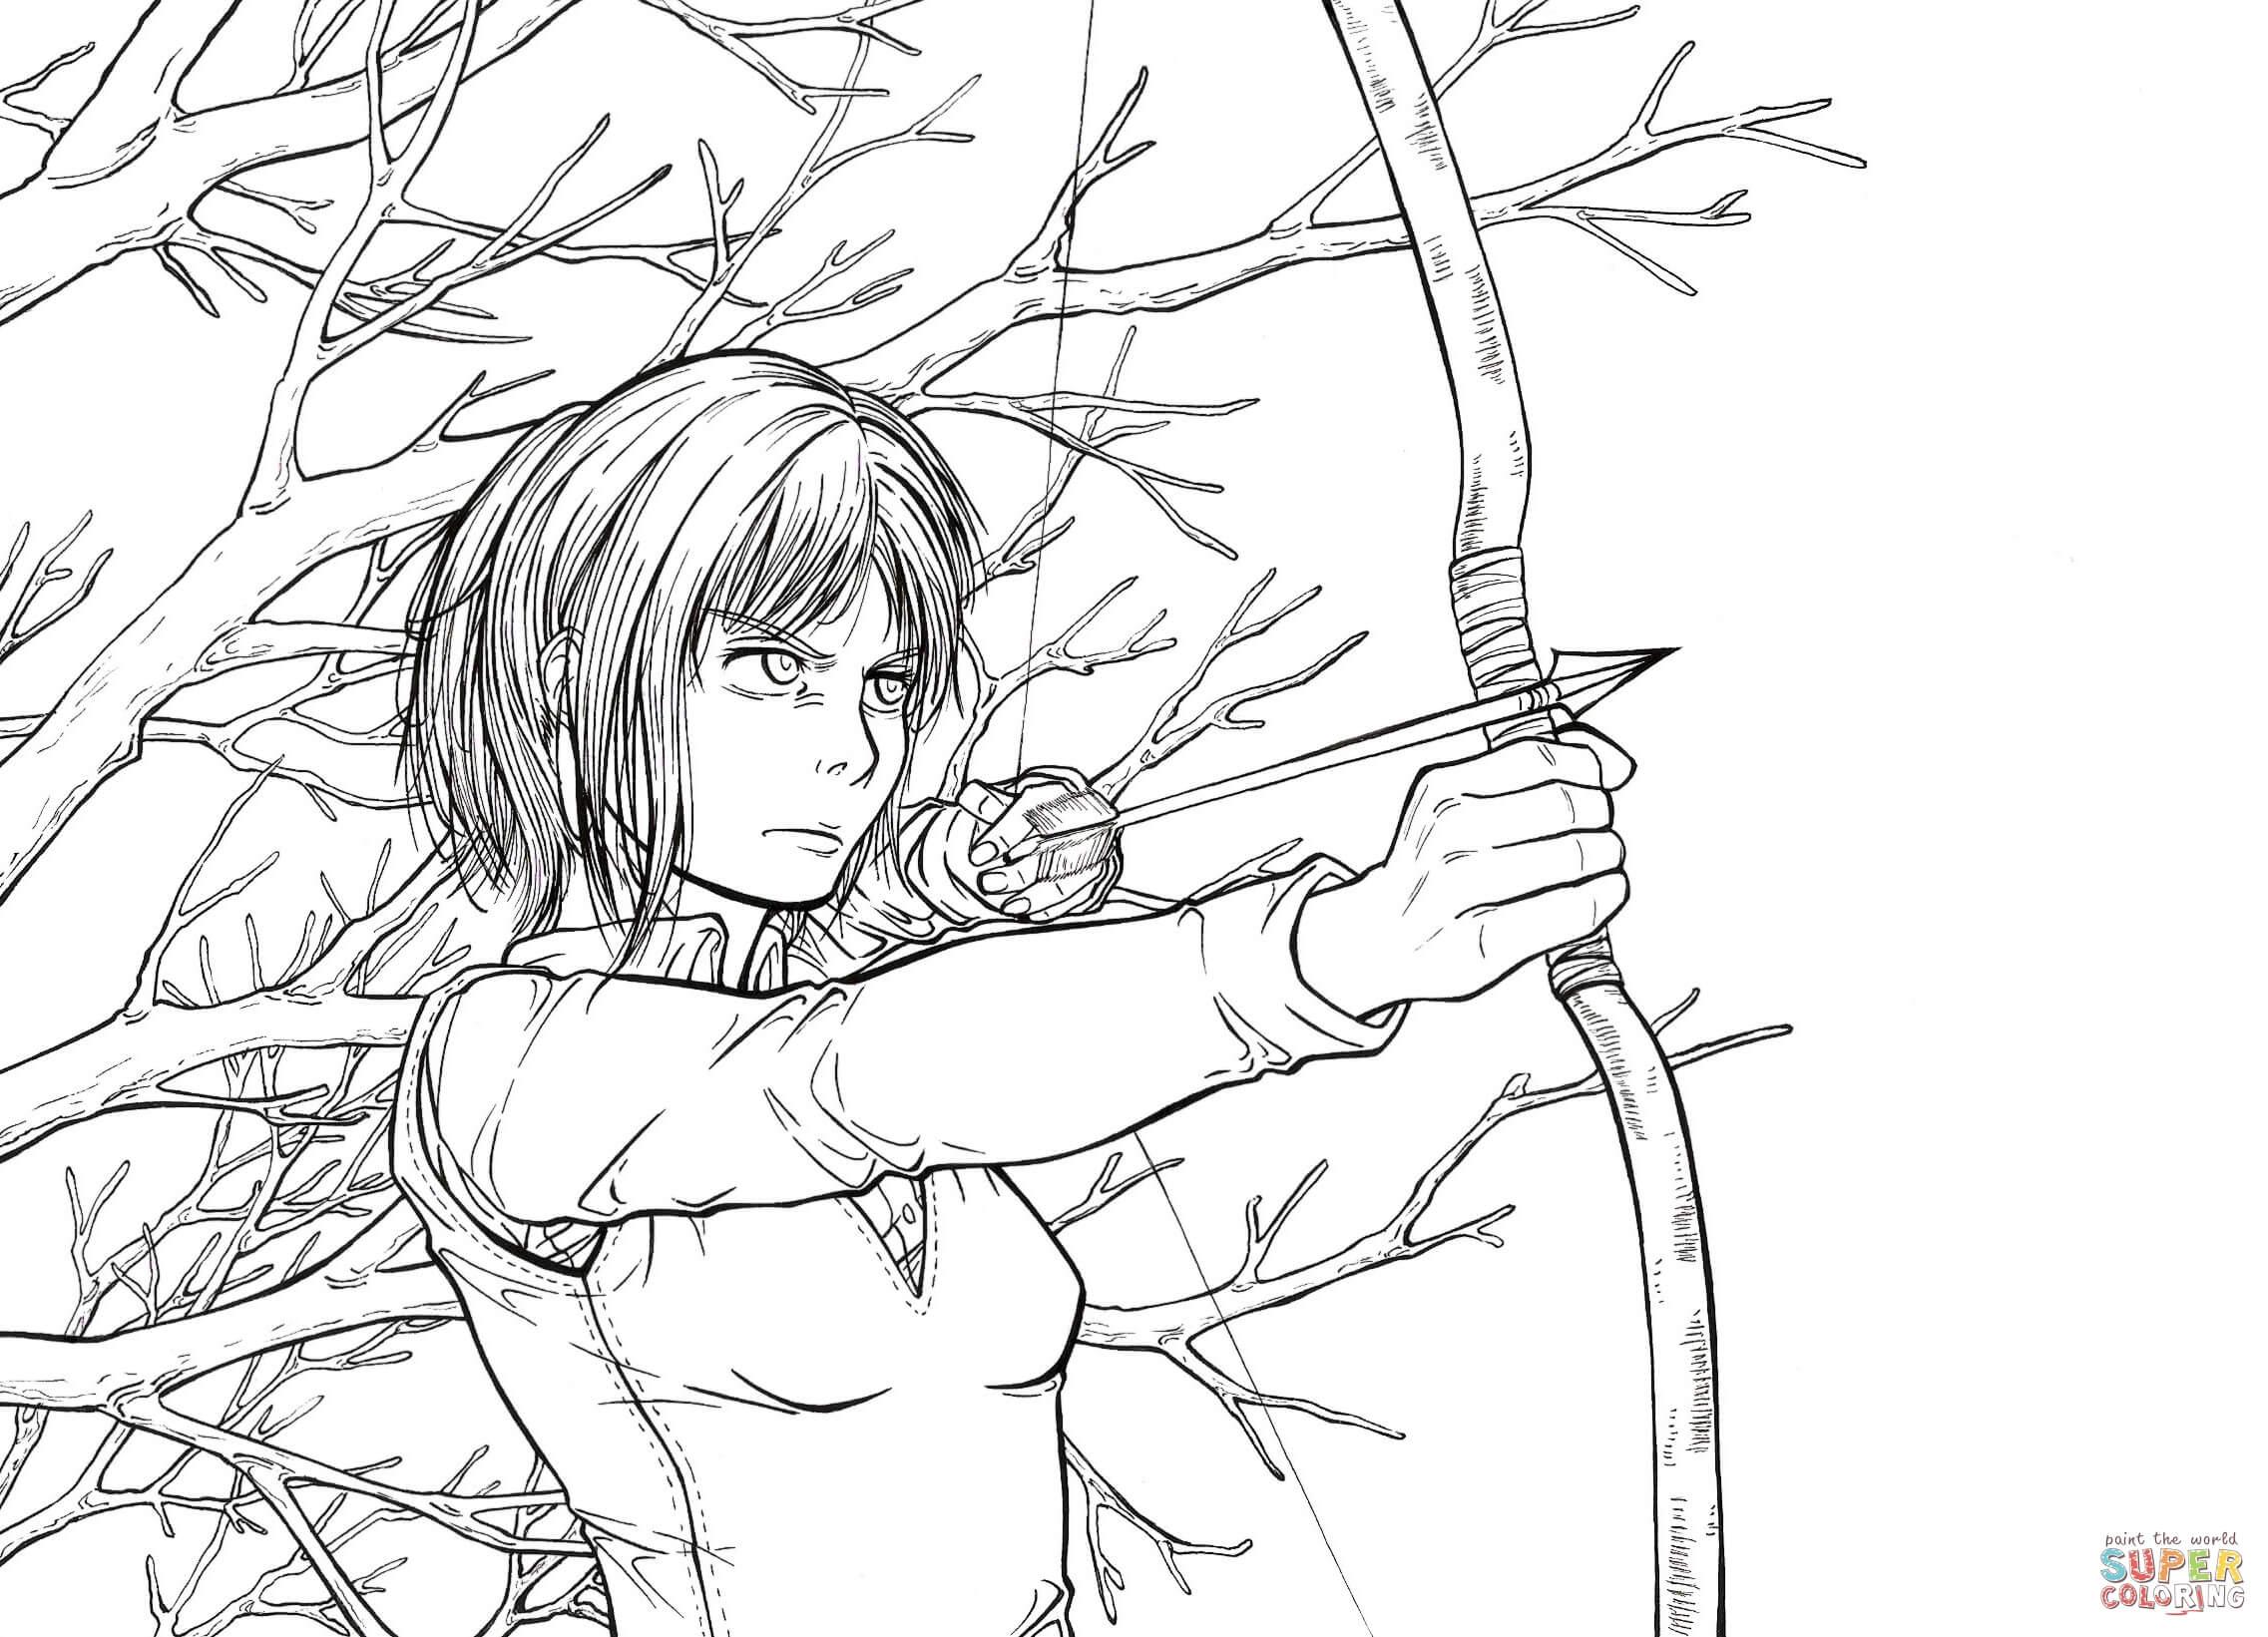 Sasha Blouse (Burausu) From Manga/Anime Series Shingeki No